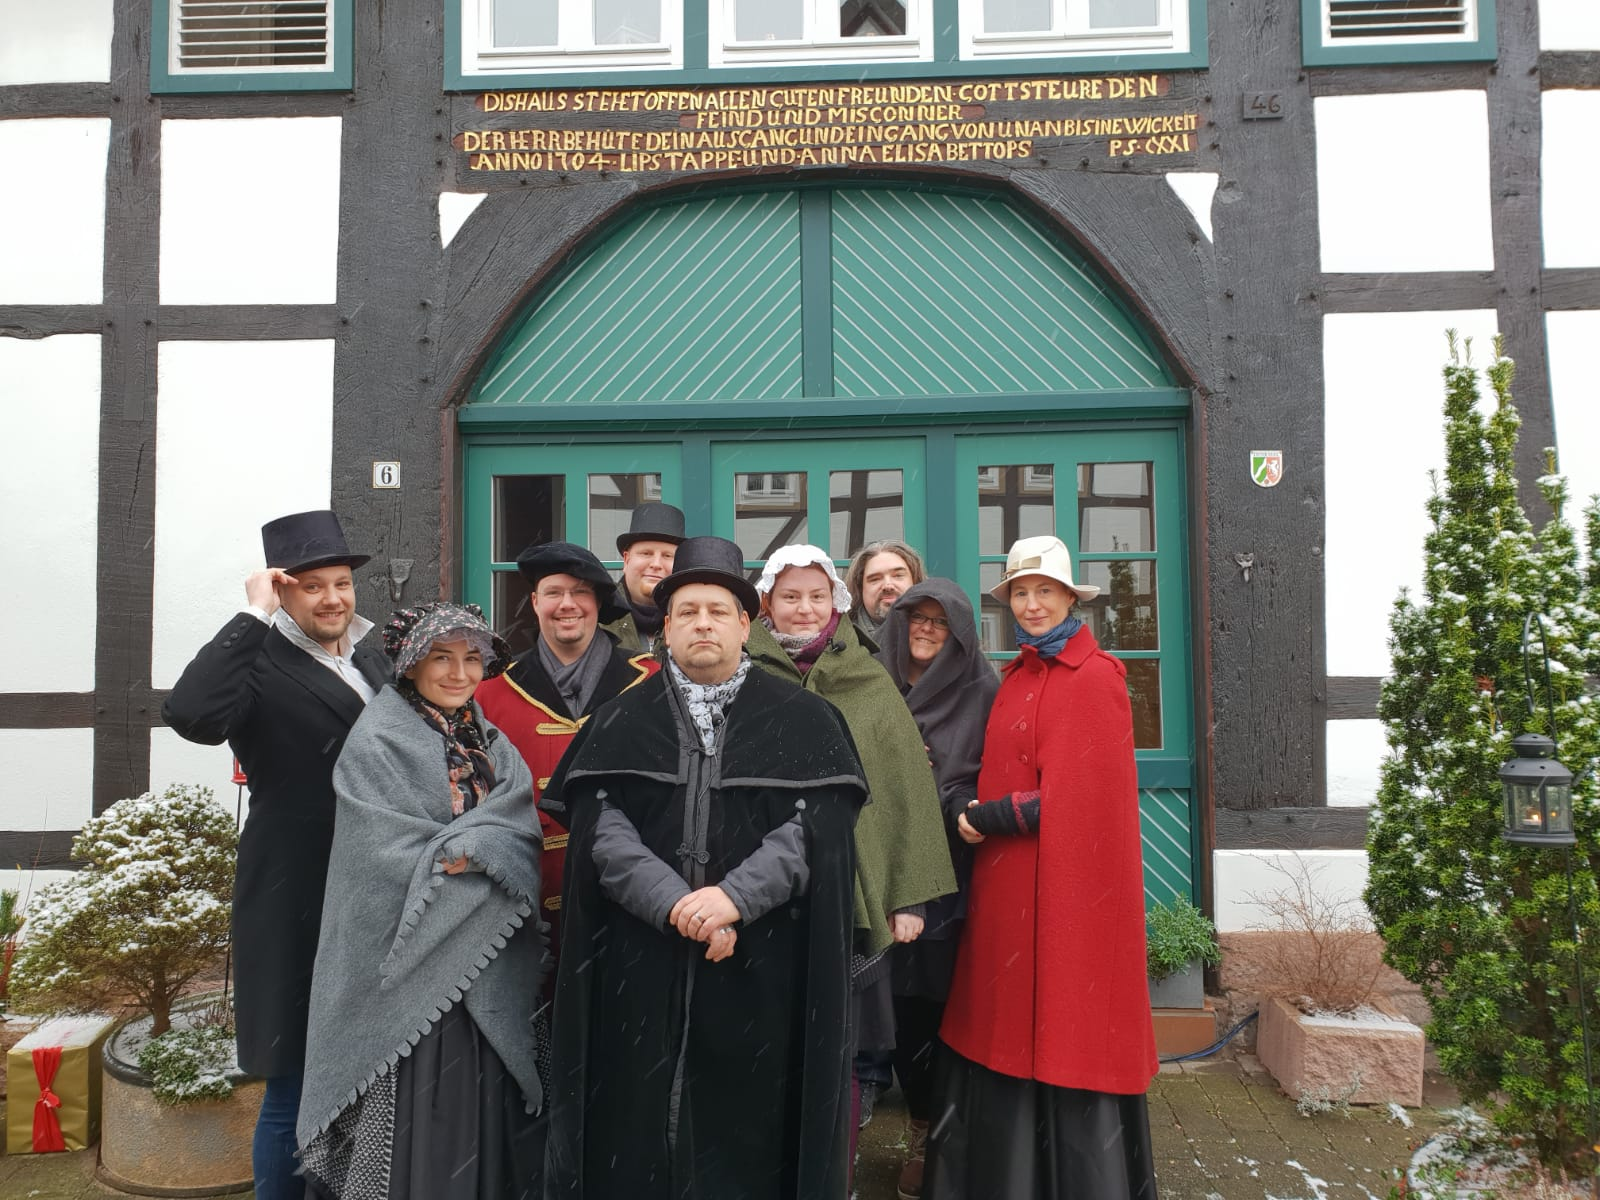 DreamTeamerLiveHörspieler in Blomberg beim Dickens Festival